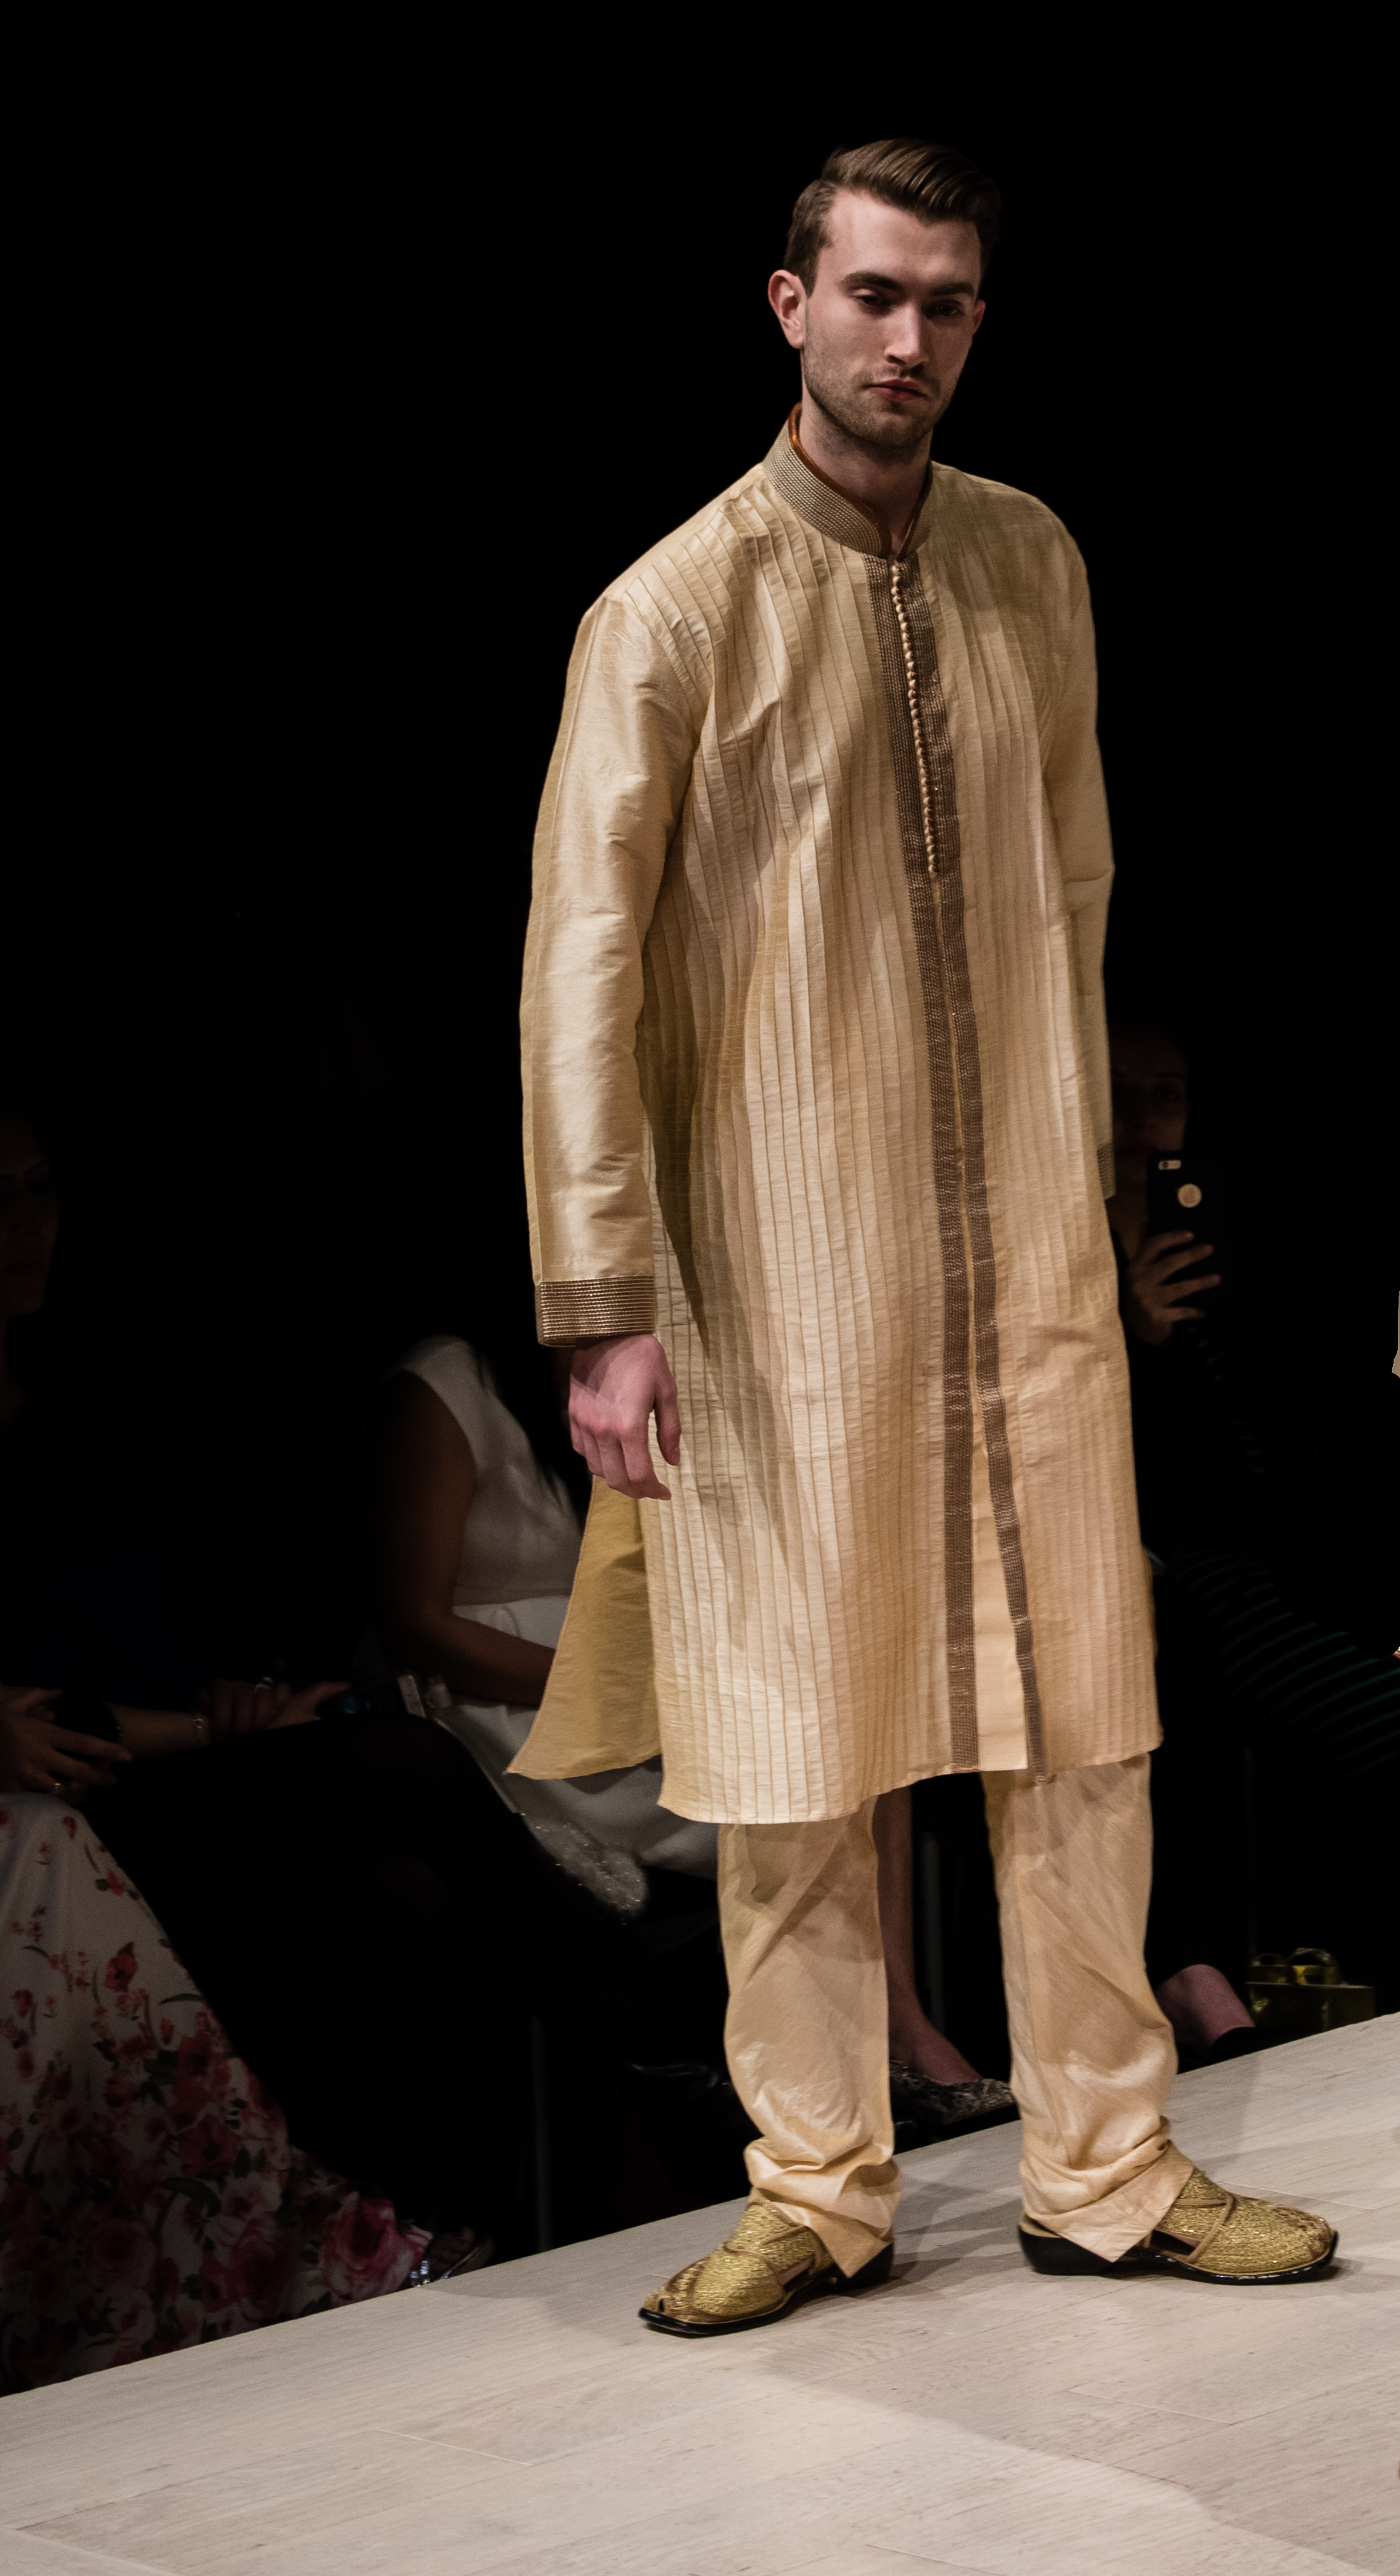 Sher Khan Niazi-WCFW-Designerz Den-3504.jpg